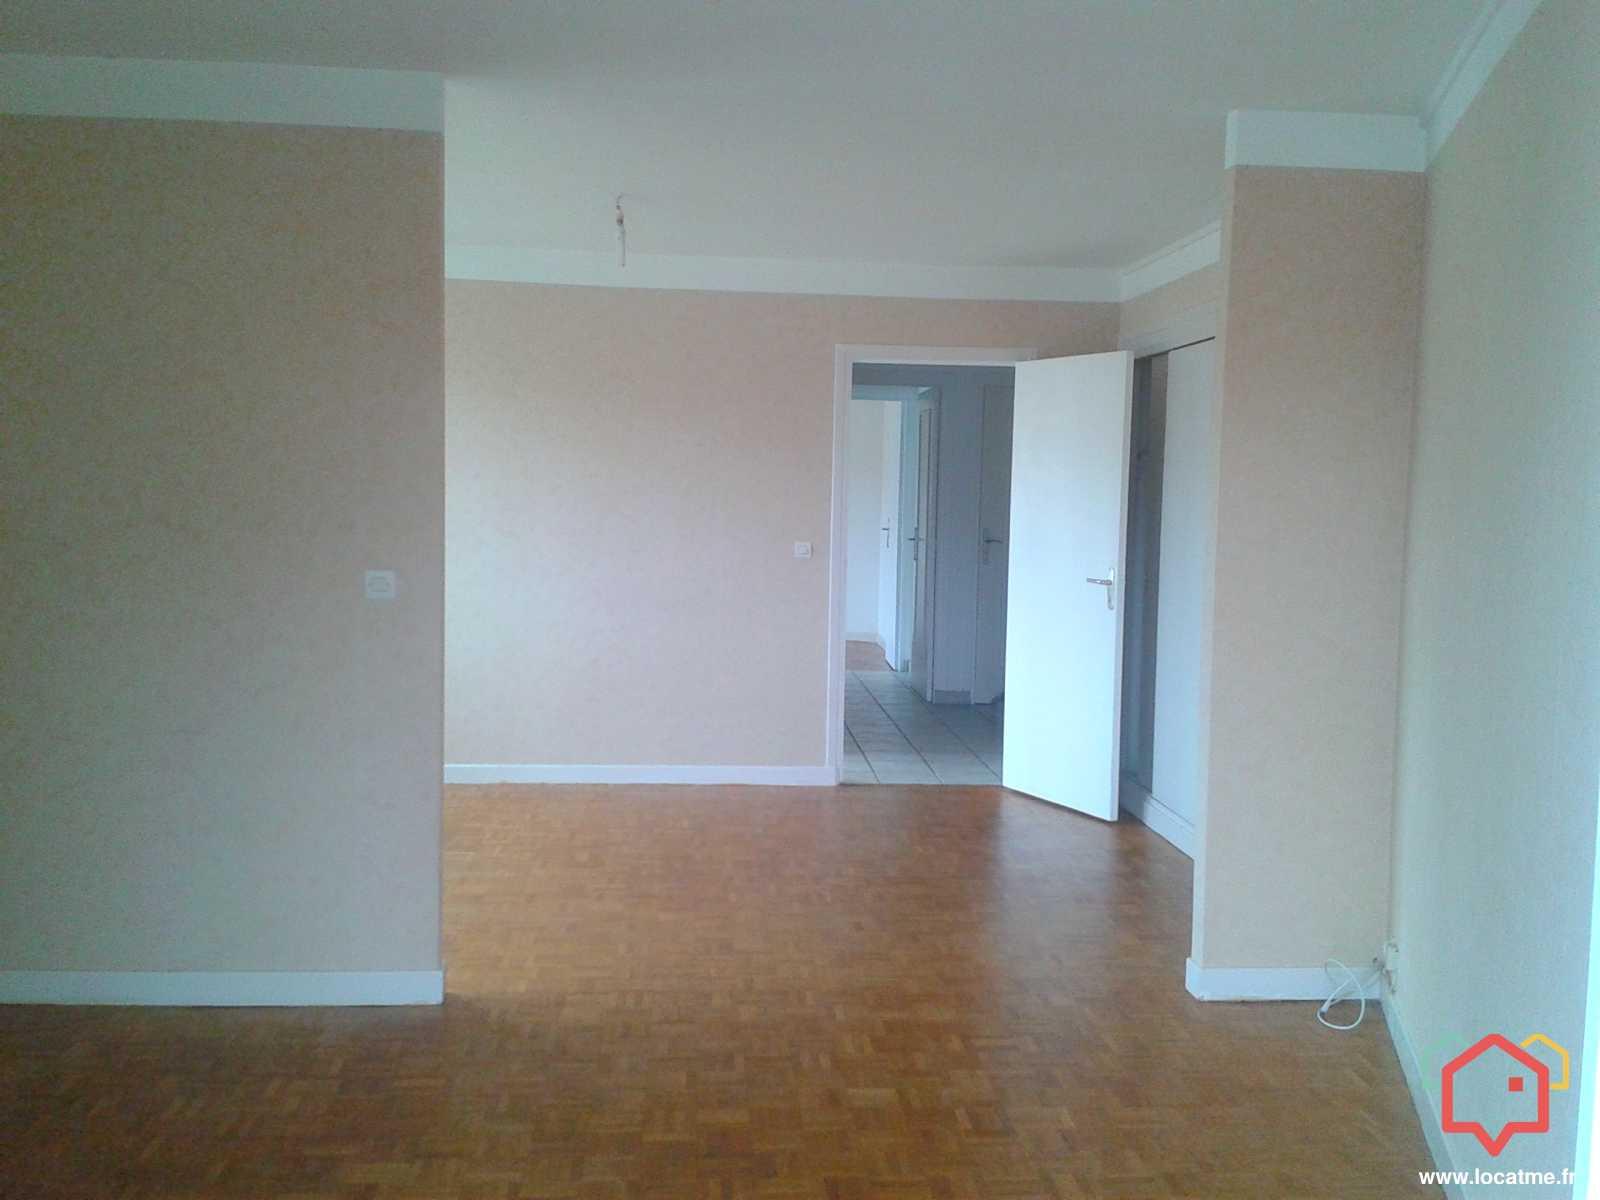 Location appartement non meubl 64m2 clermont ferrand - Location meuble clermont ferrand 63000 ...